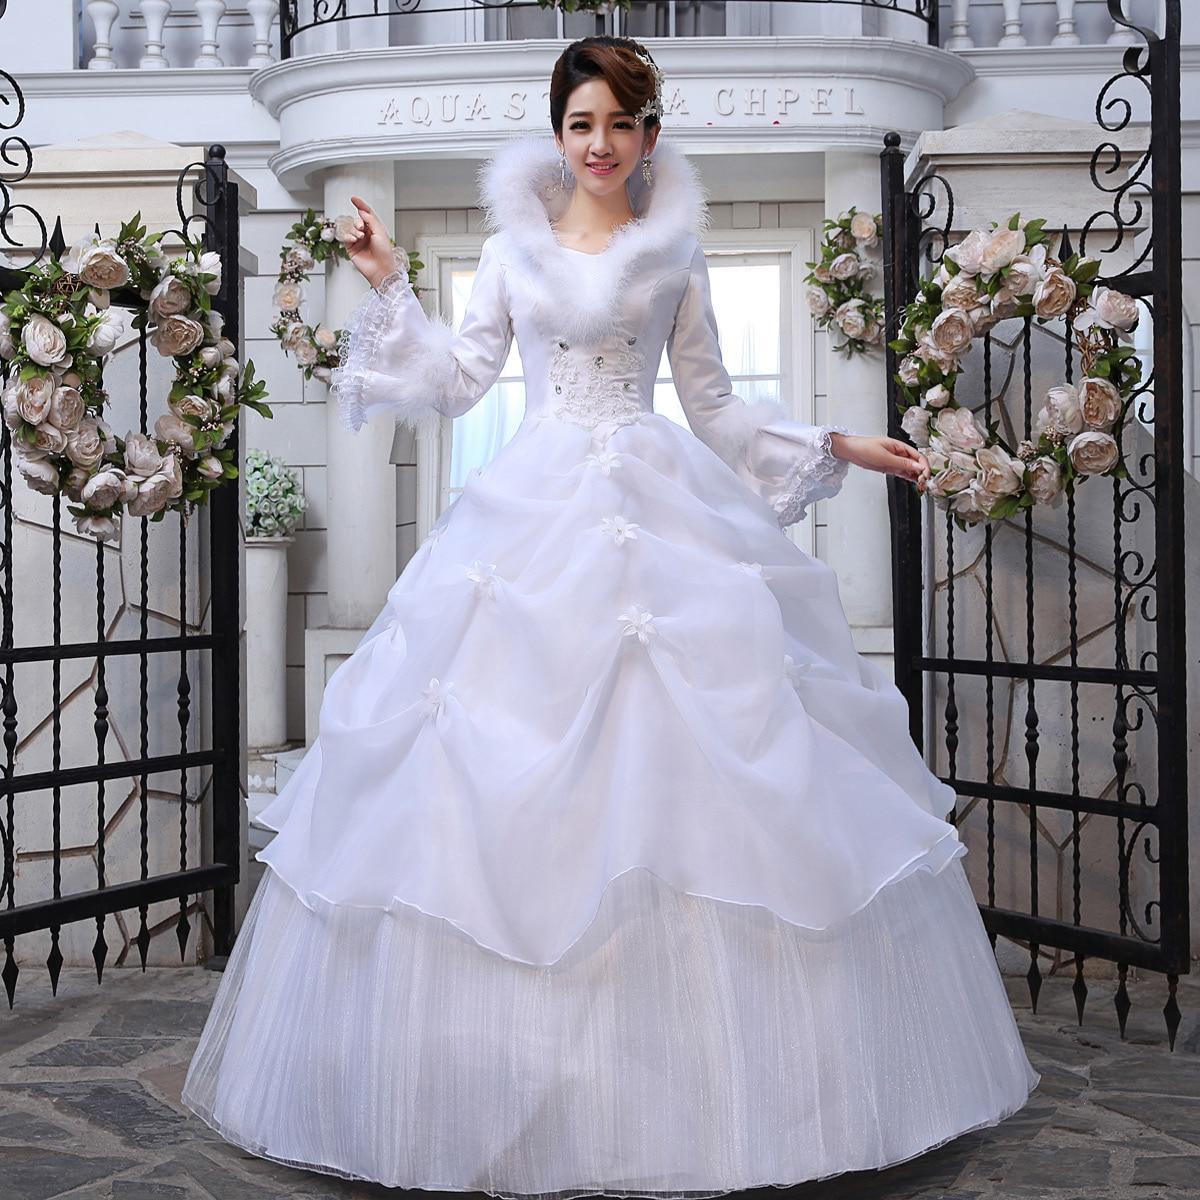 Clearance wedding dresseswedding dressesdressesss clearance wedding dresses ombrellifo Gallery